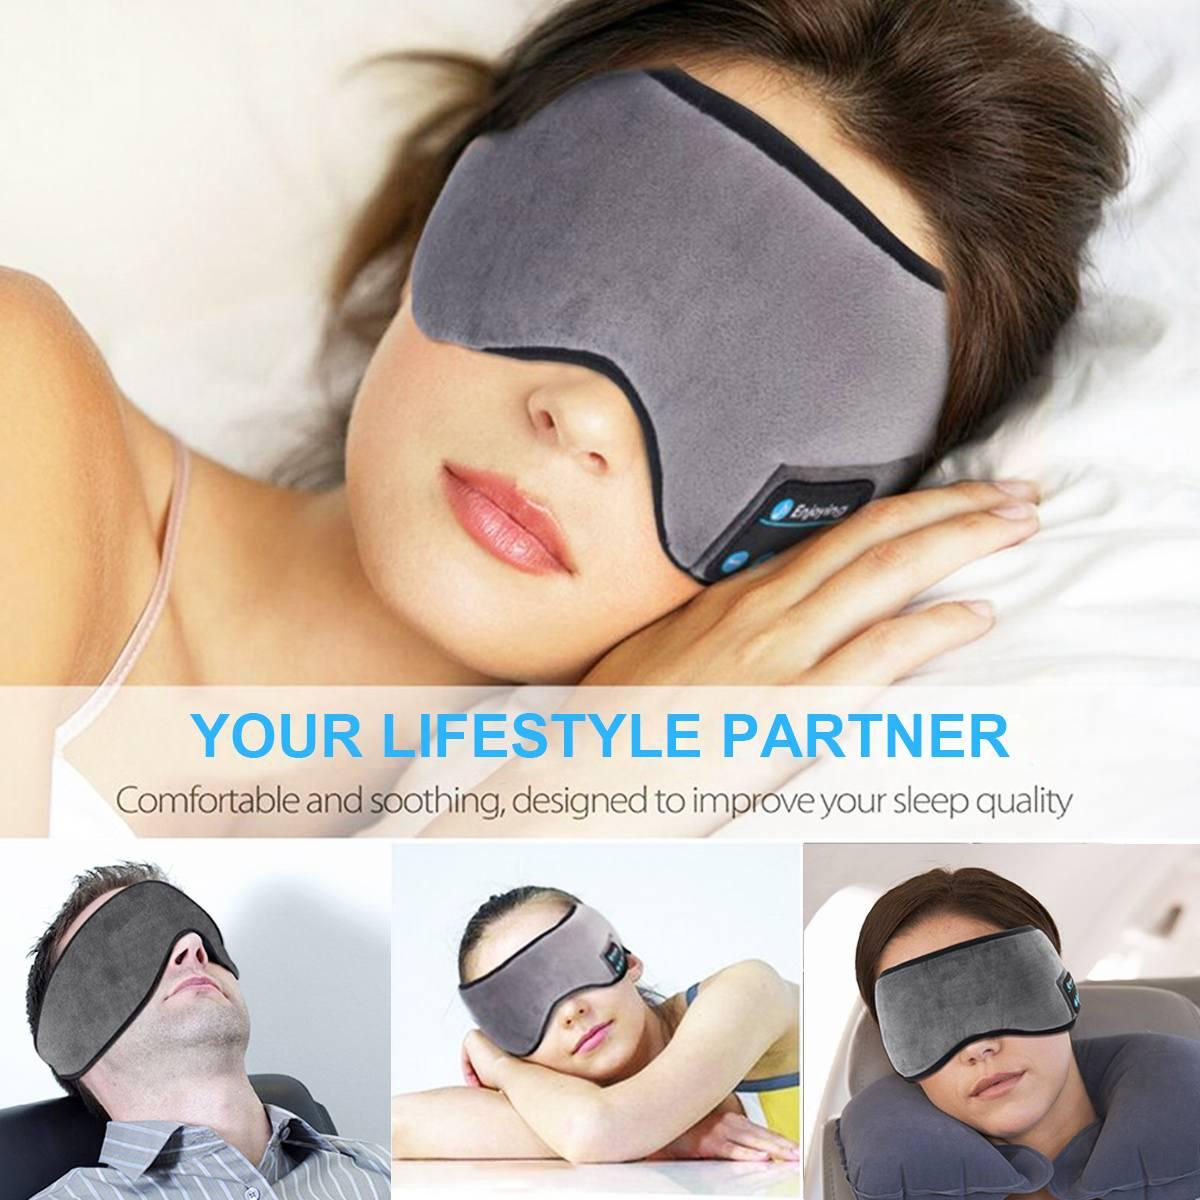 Sleep Headphone Bluetooth Sleep Mask Wireless Sleep Eye Mask Earphone Travel Eye Shades with Built-in Speakers Mic Handsfree mic Pakistan